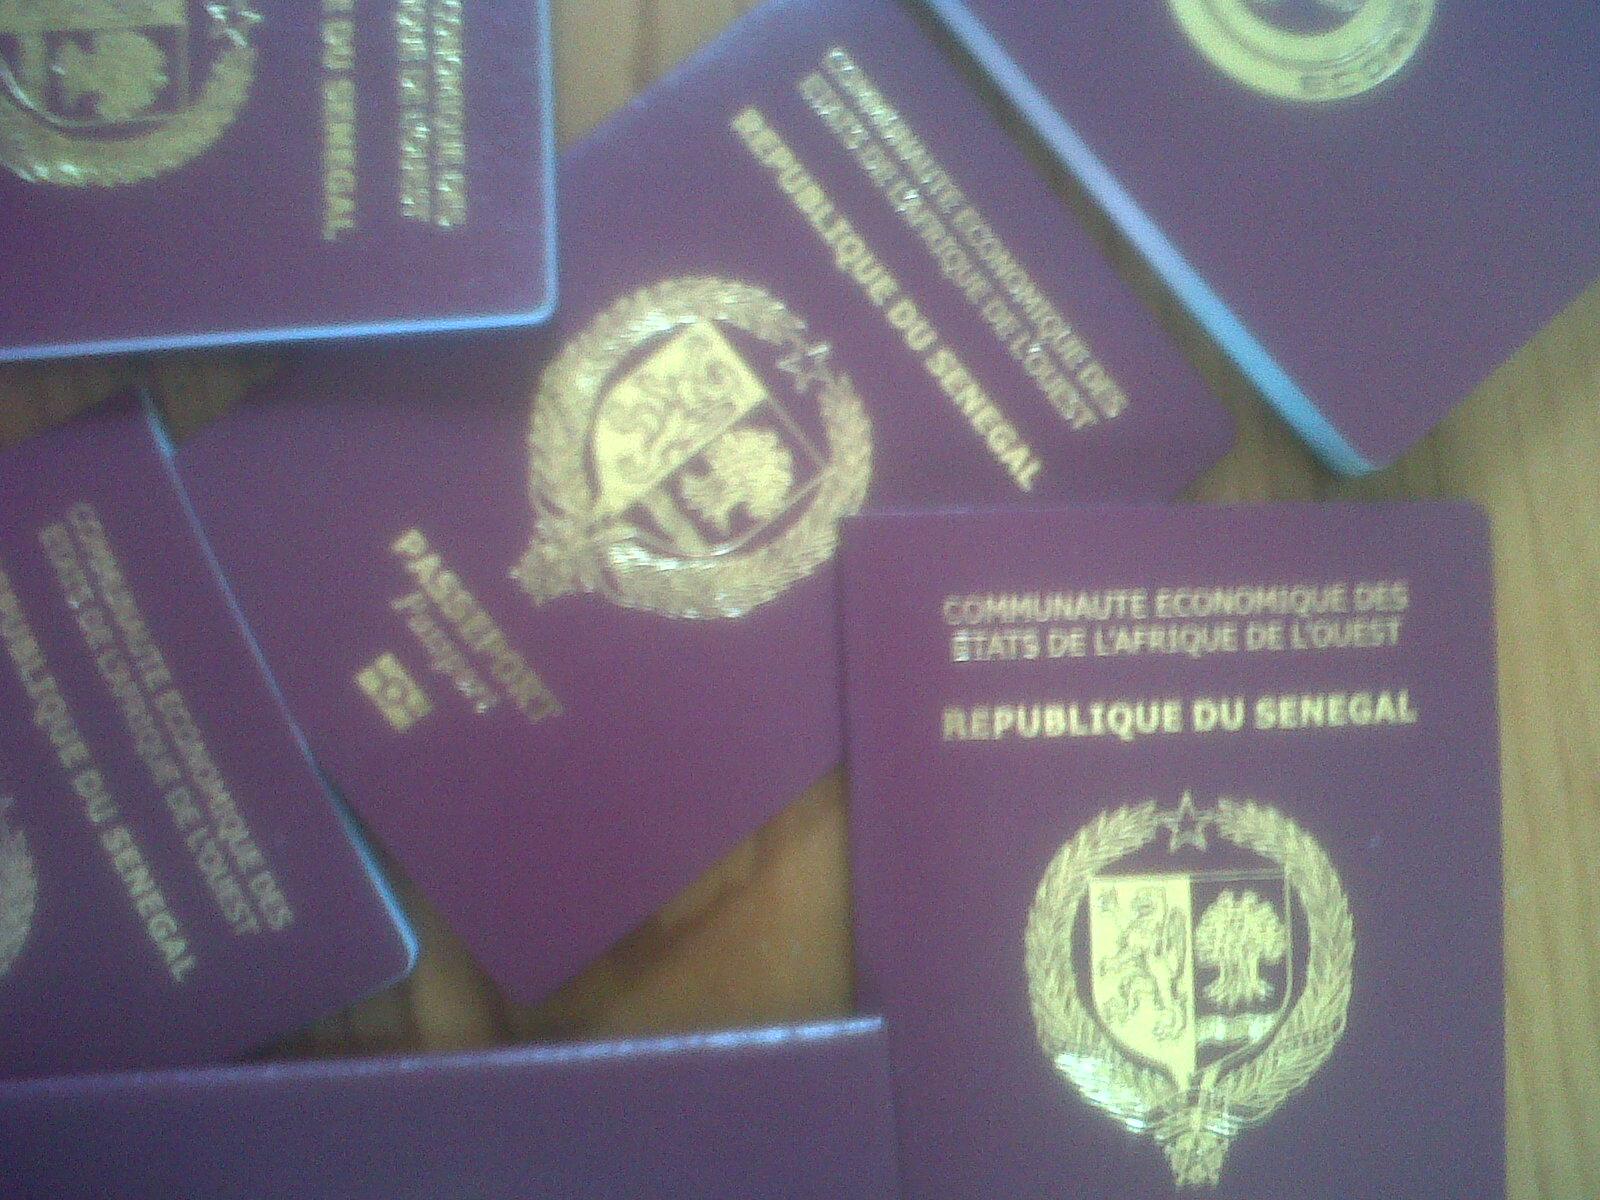 Macky, la famille de feu Djily Mbaye et les passeports